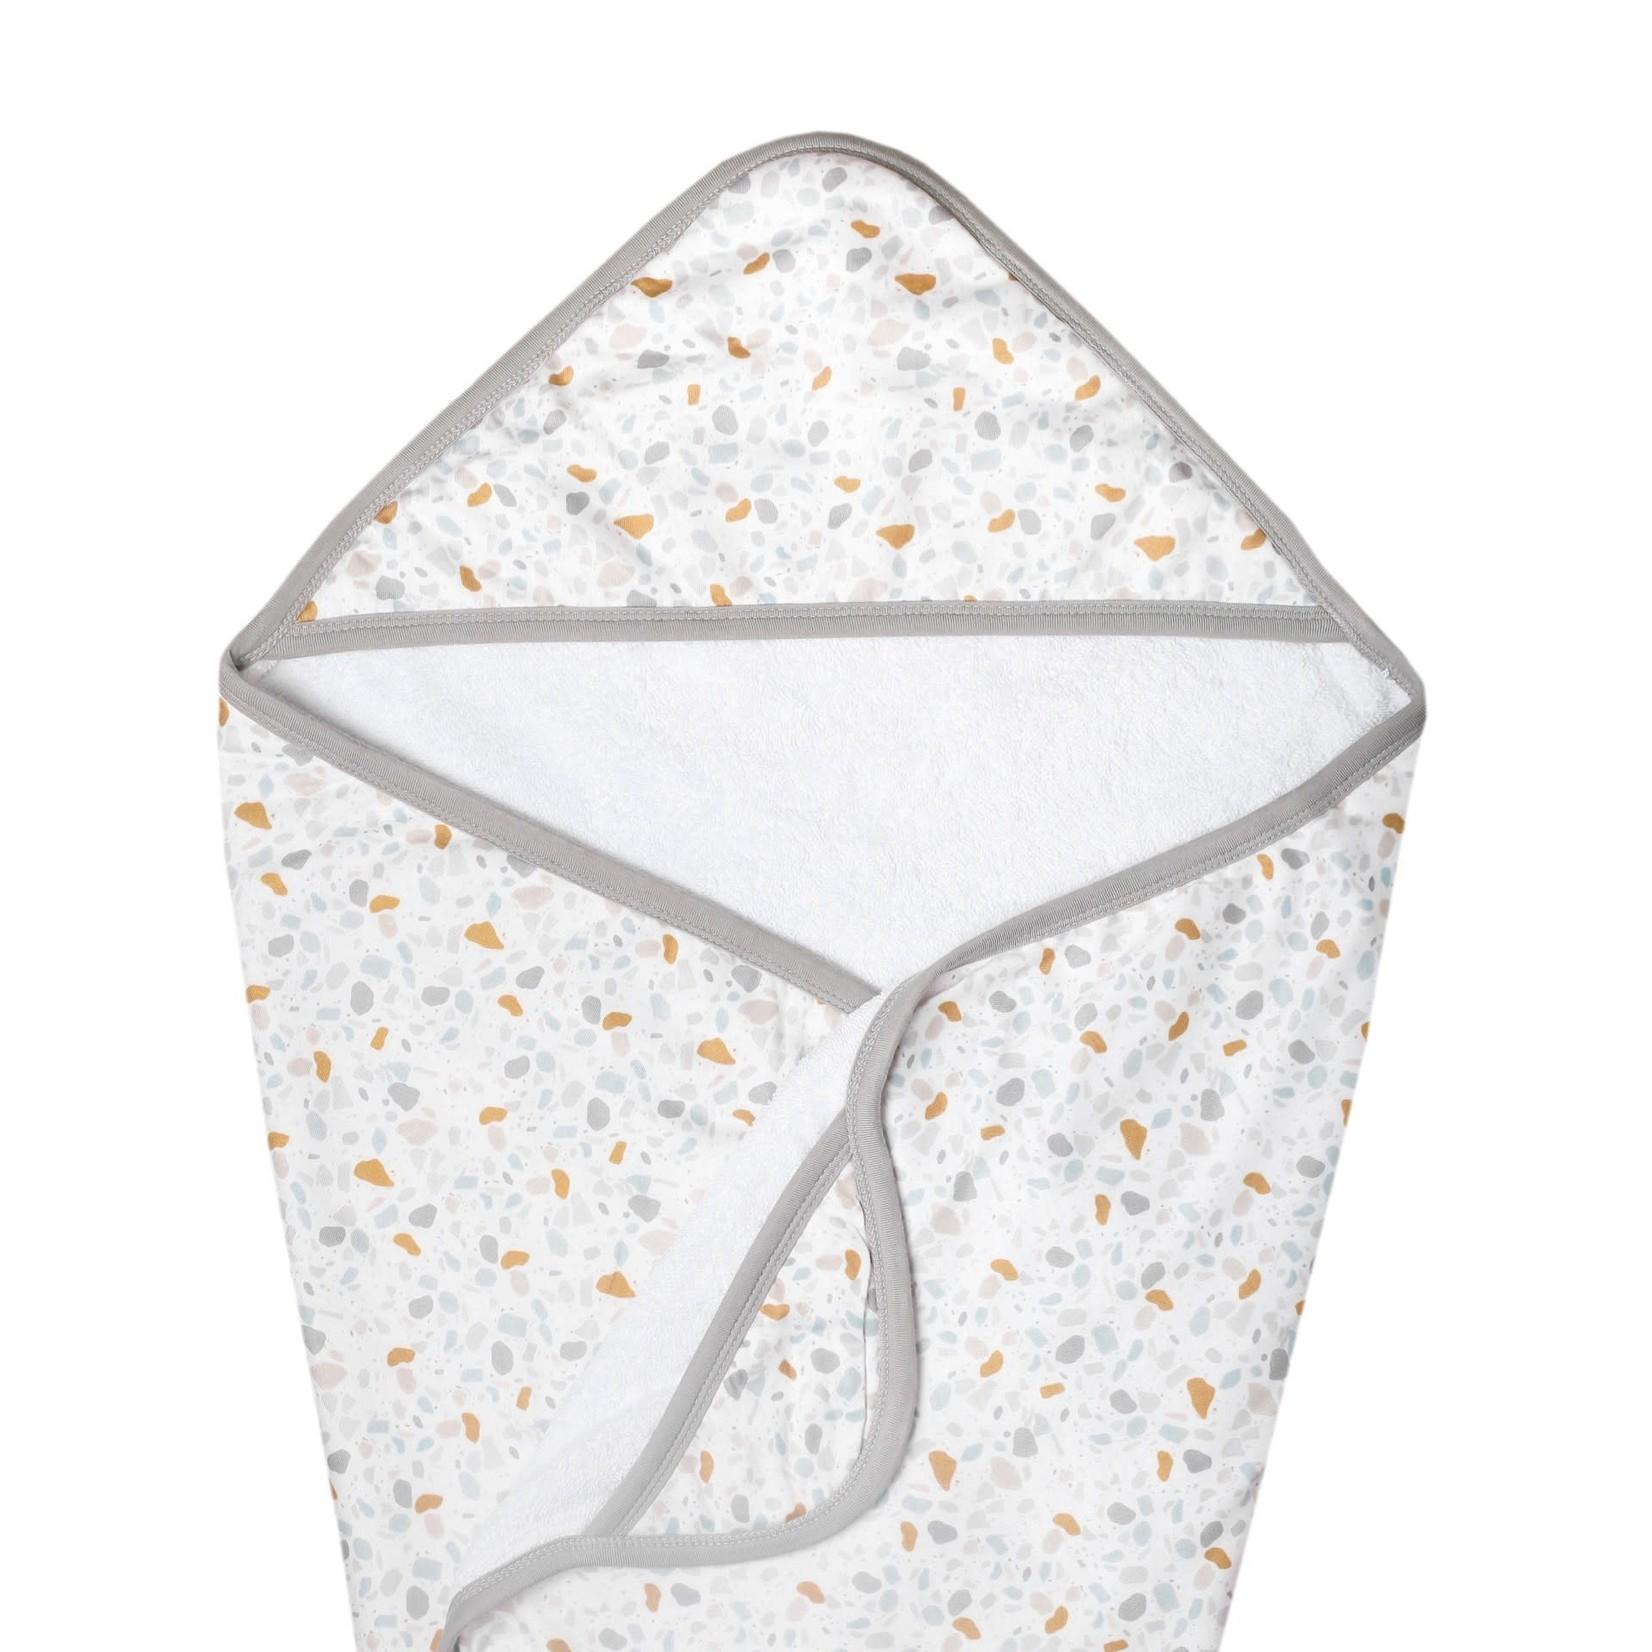 Copper Pearl Knit Hooded Towel - Arlo